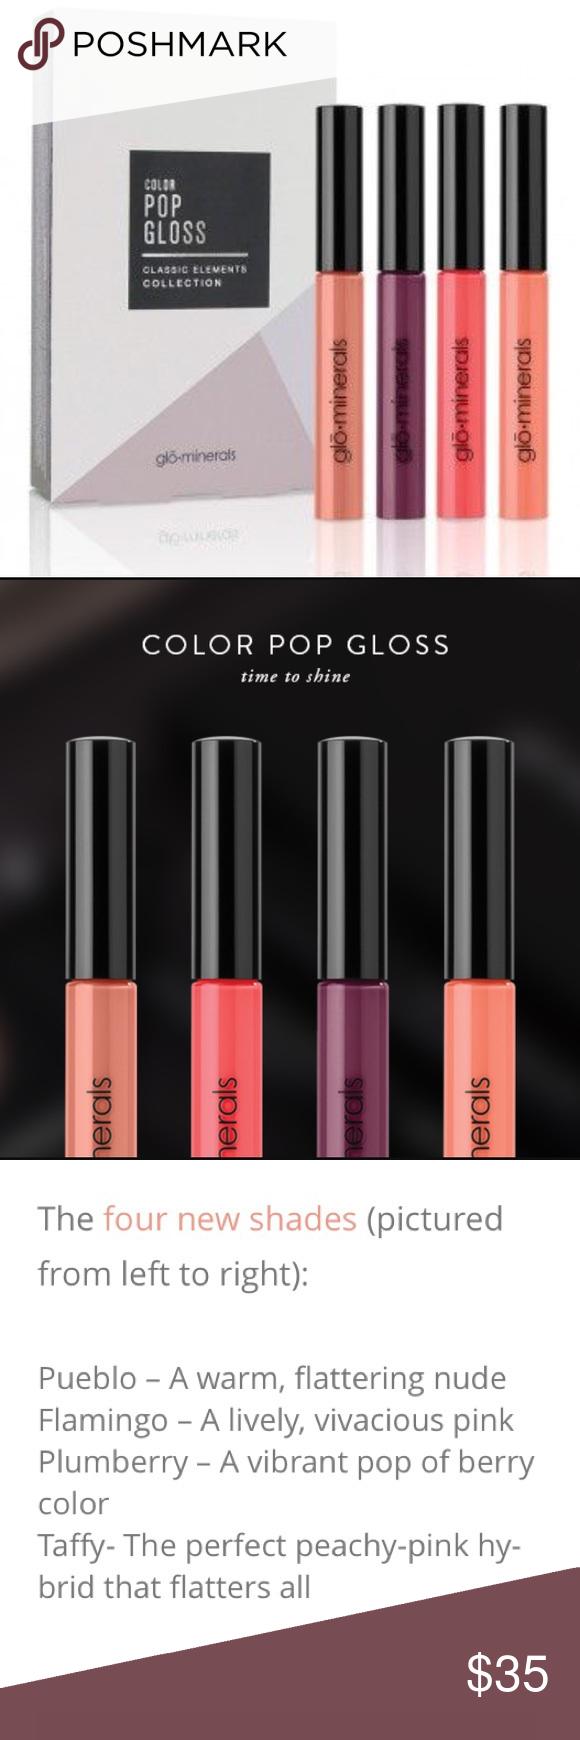 Lip gloss name ideas gloss ideas, ideas for lipgloss